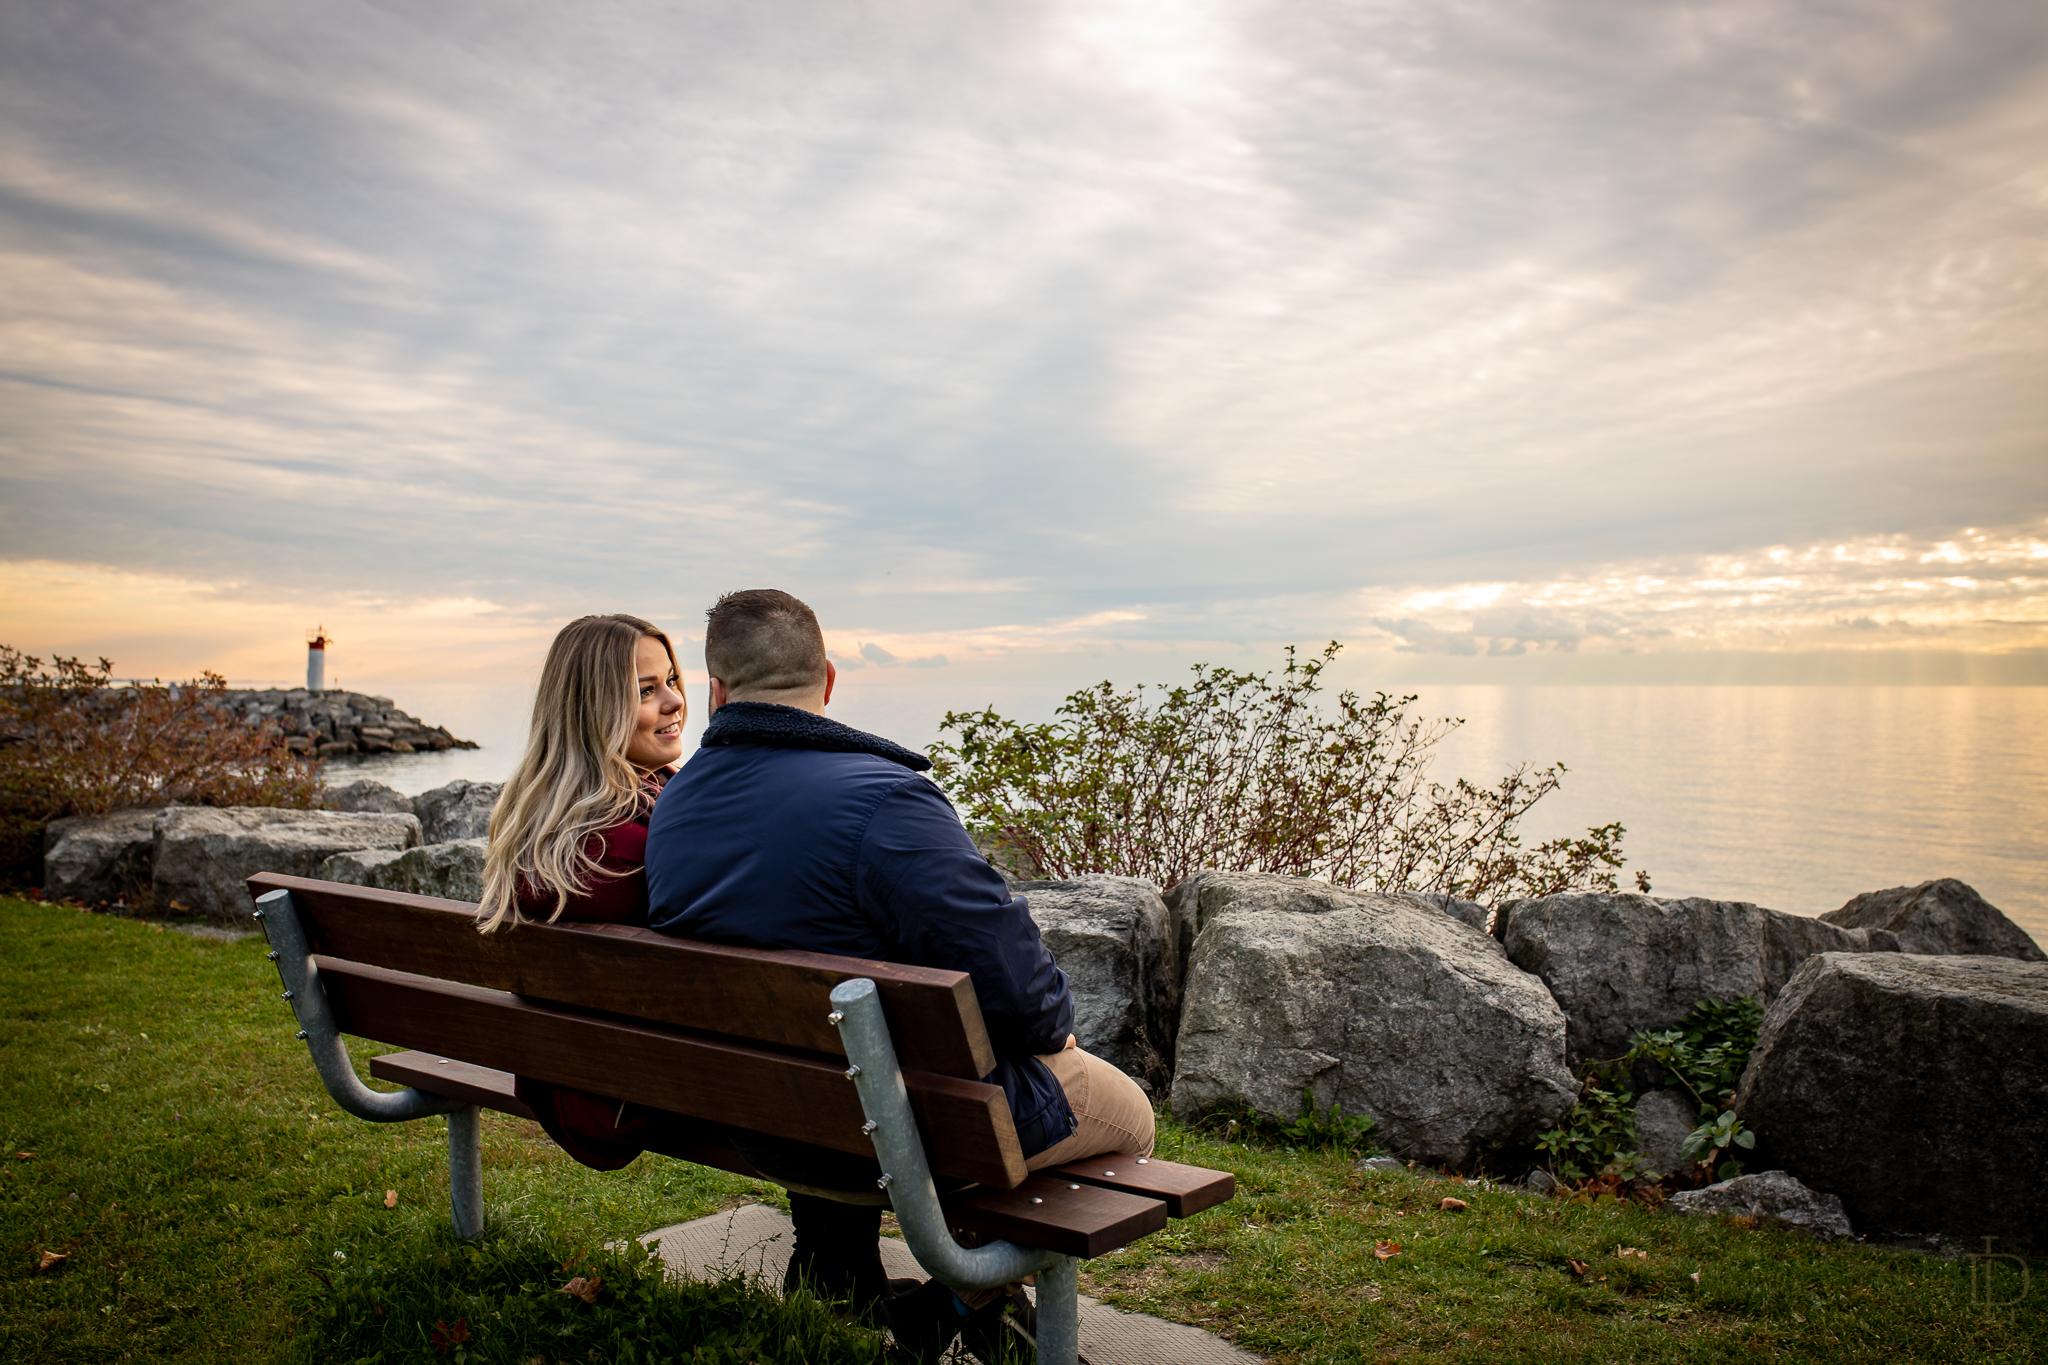 sunrise-engagement-photos-10.jpg